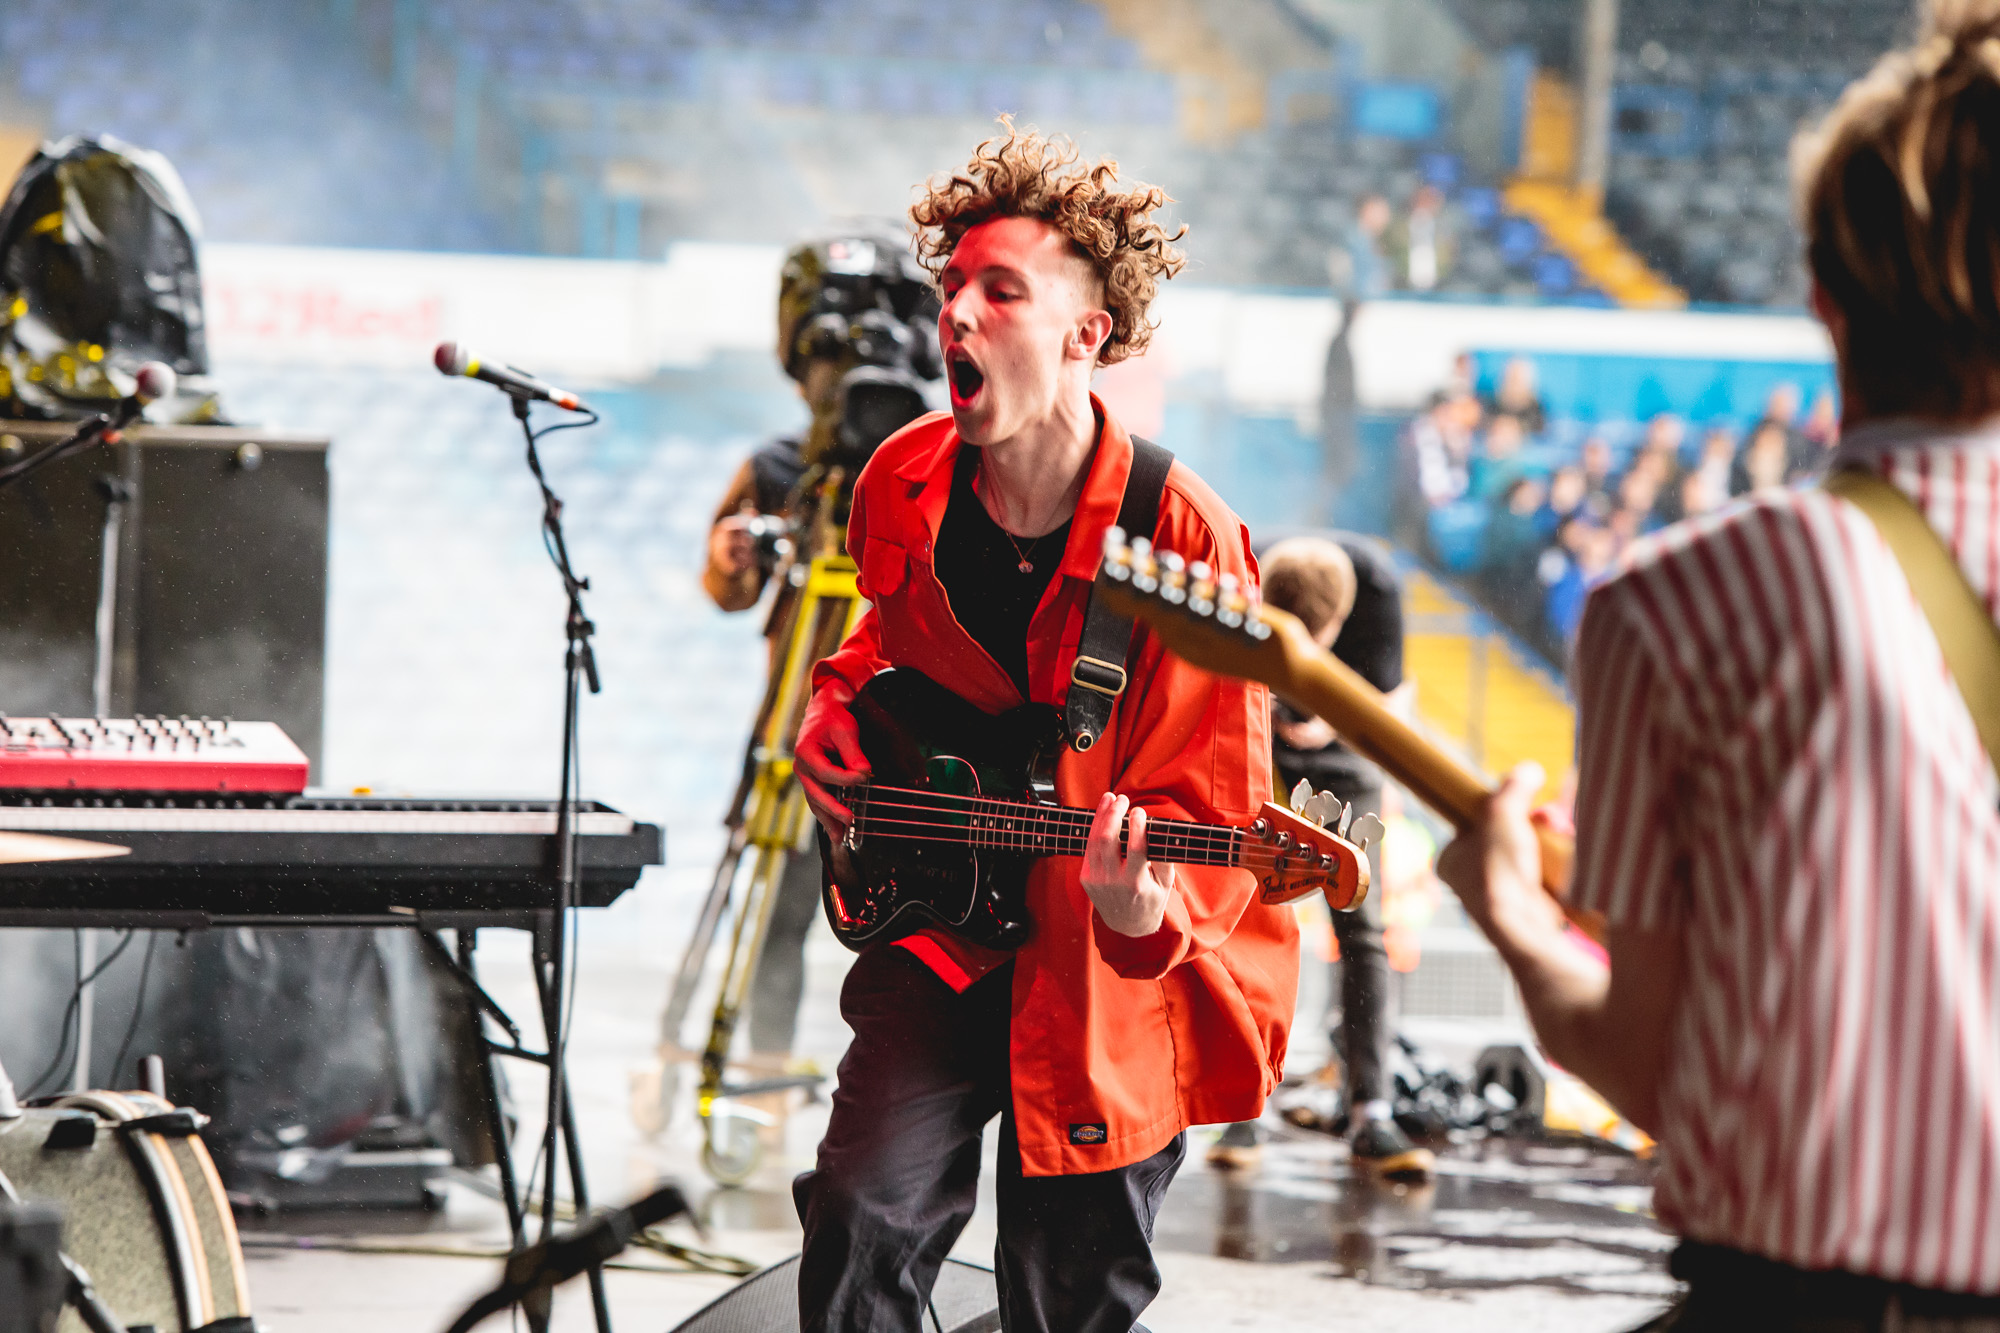 Marsicans_DannyPayne-12.jpg